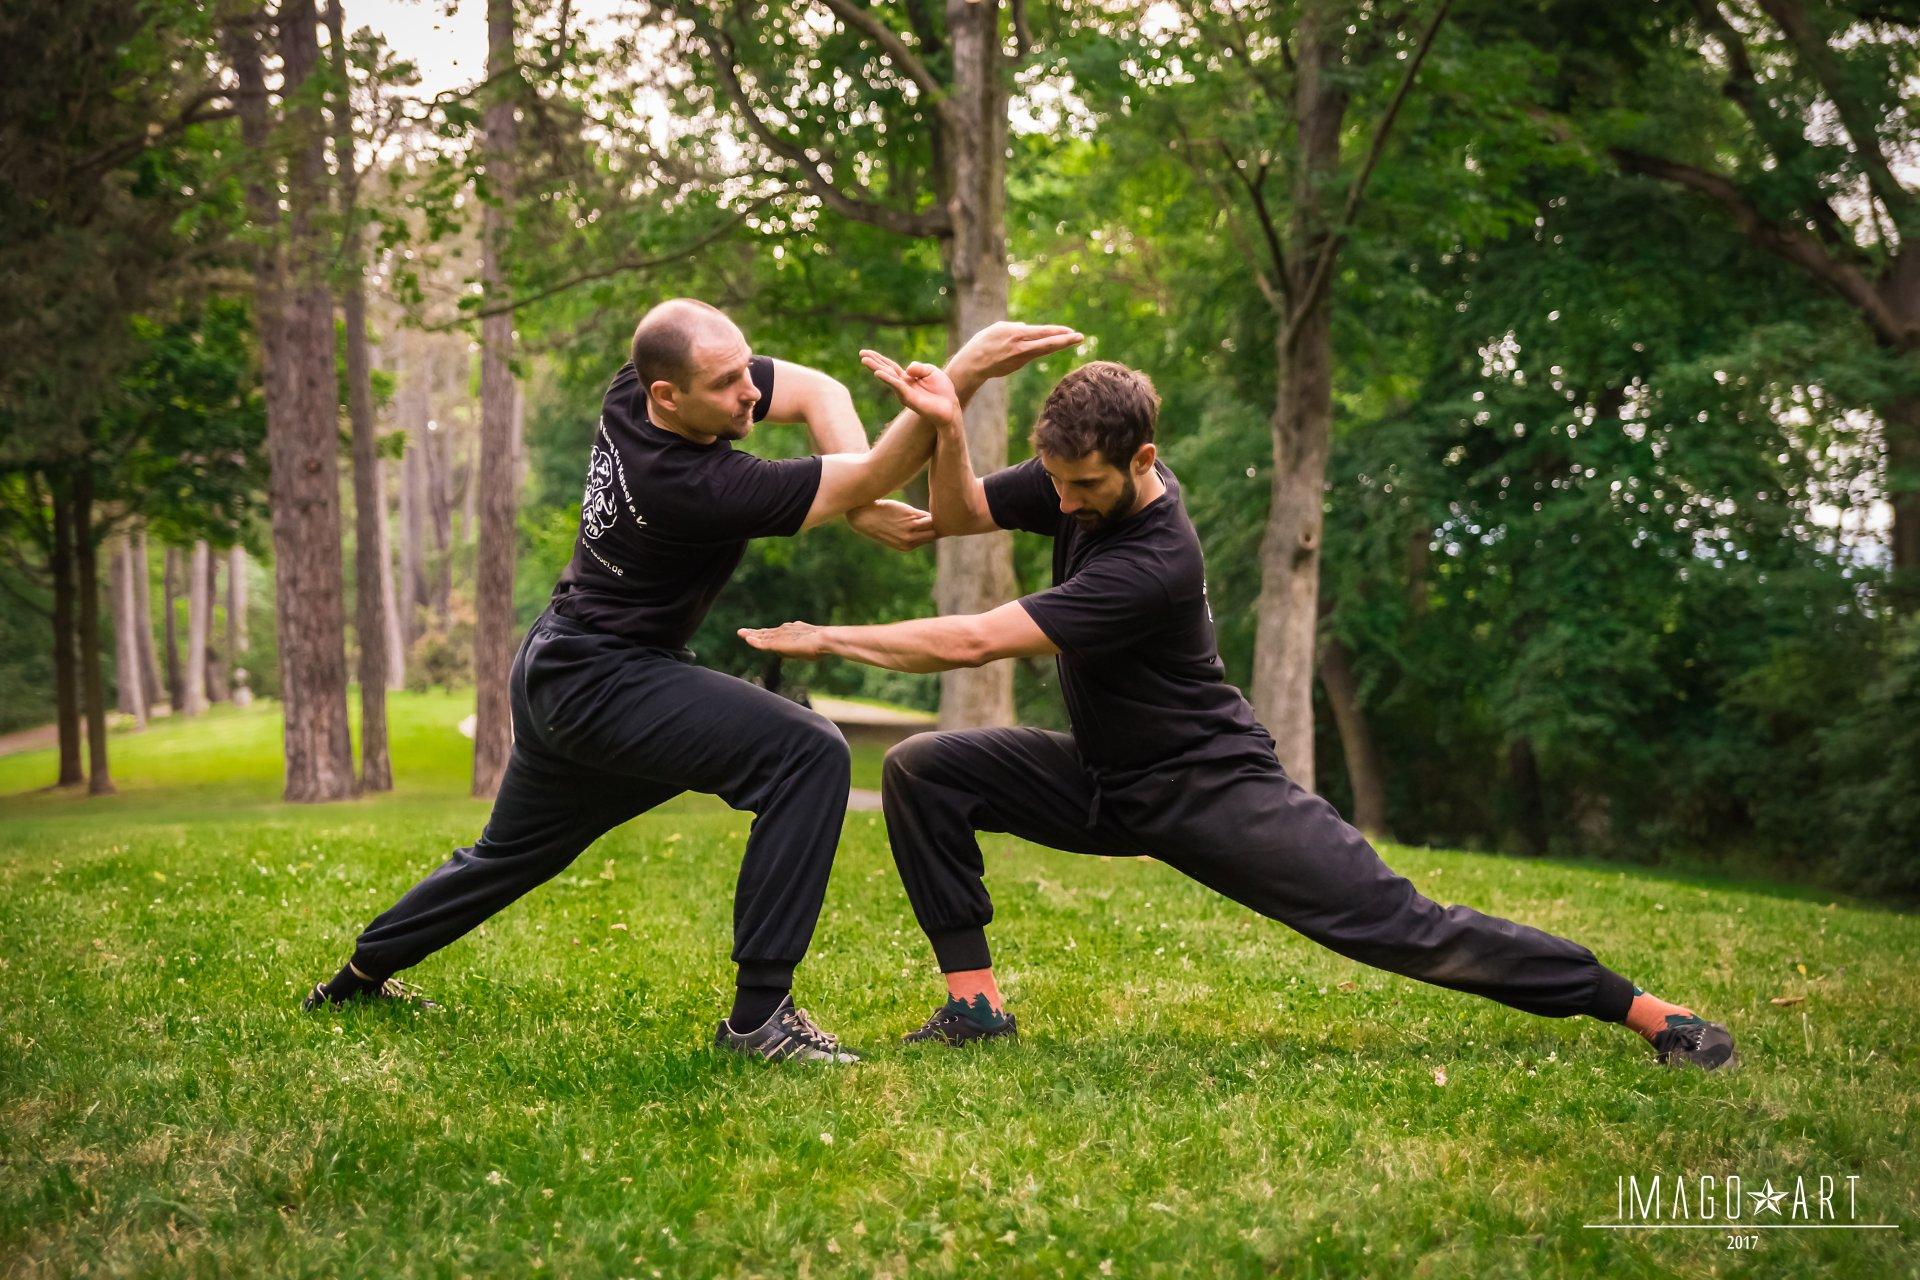 Kung Fu Freikampf